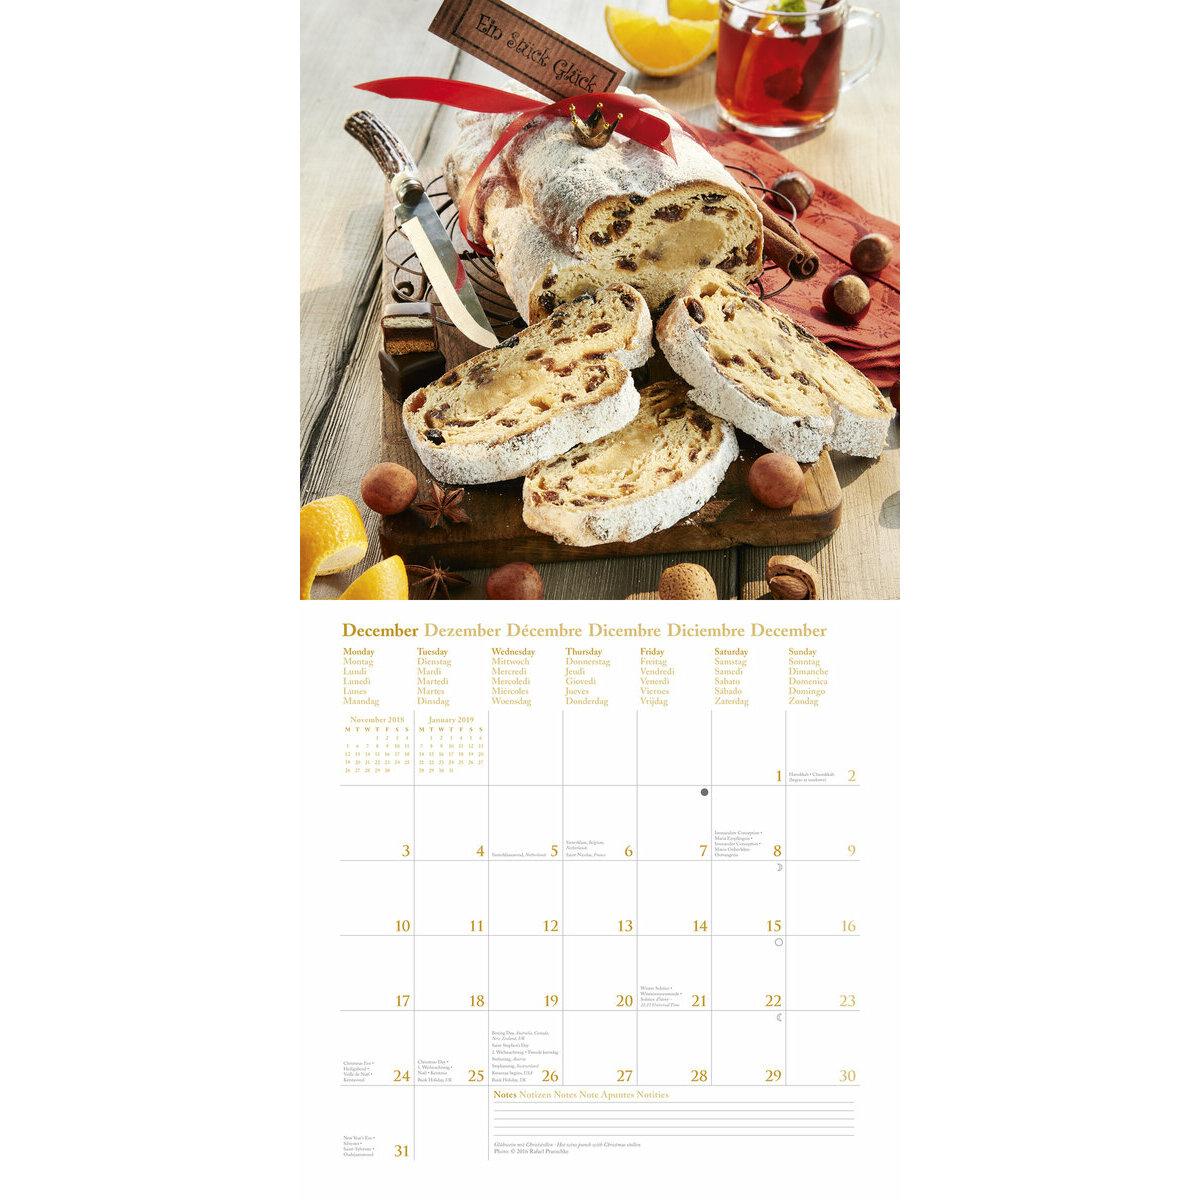 Calendrier 2018 cuisine gourmande par rafael pranschke for Cuisine gourmande